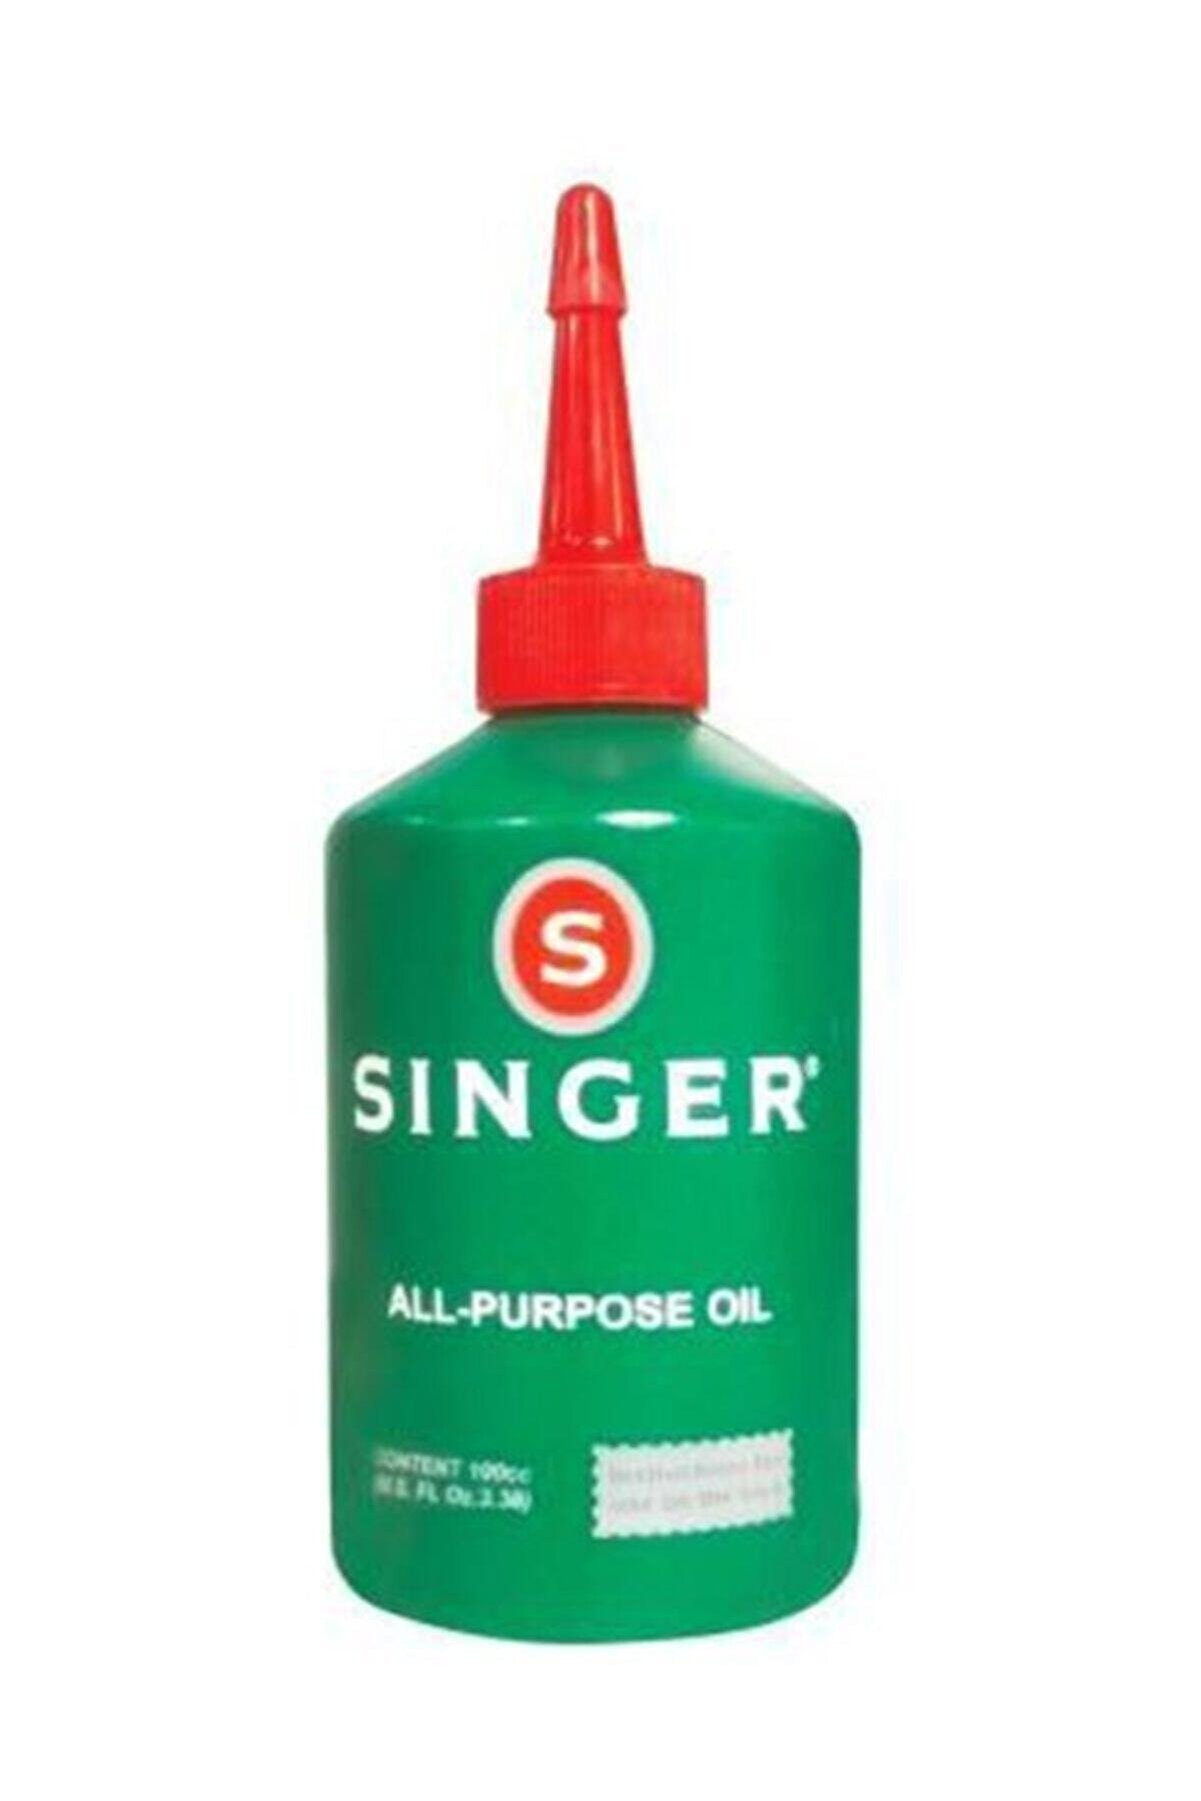 SINGER Dikiş Makina Yağı Yağ 100 ml